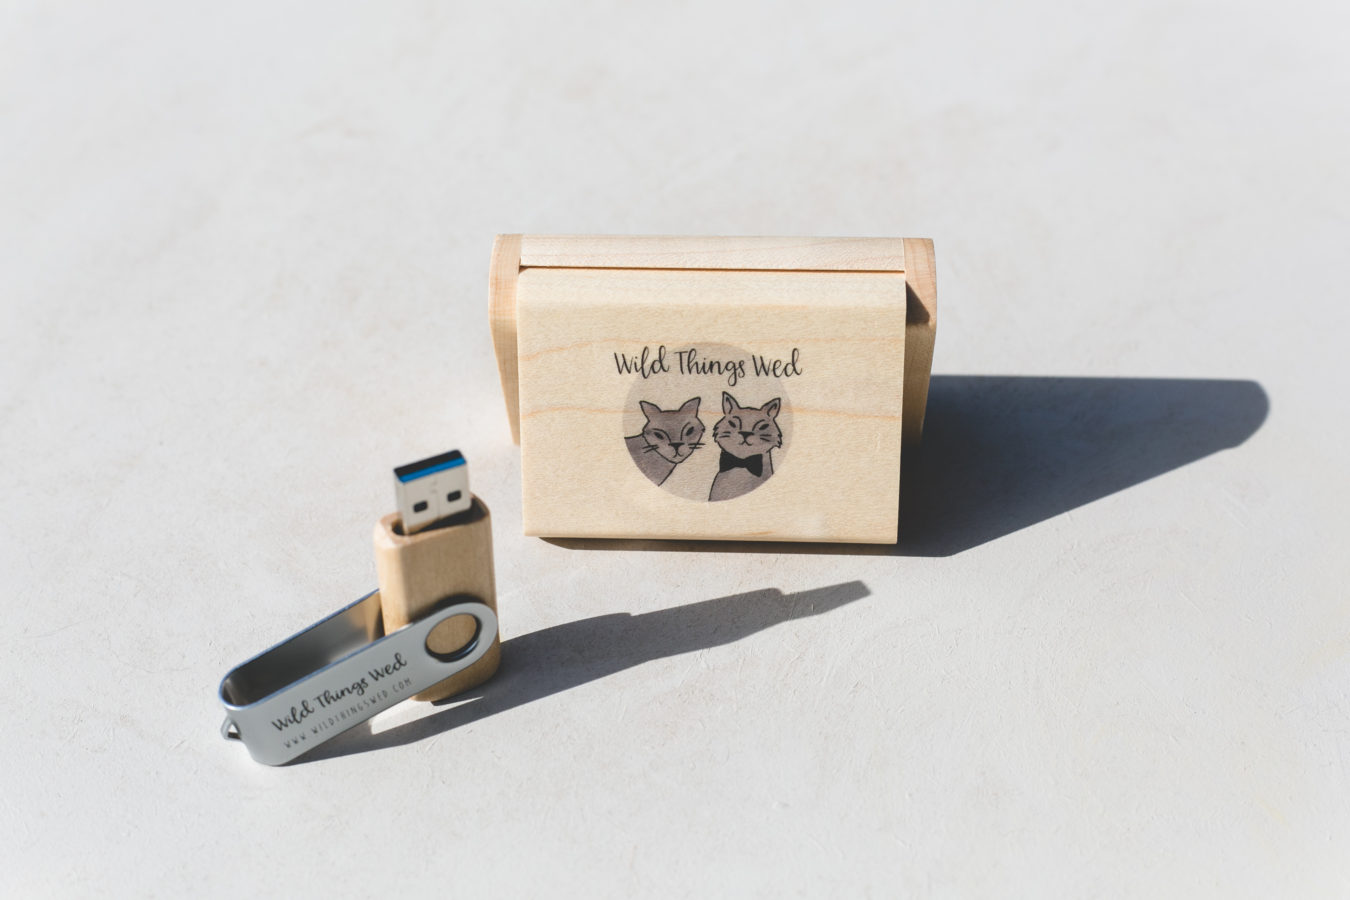 USBs and Branding-5